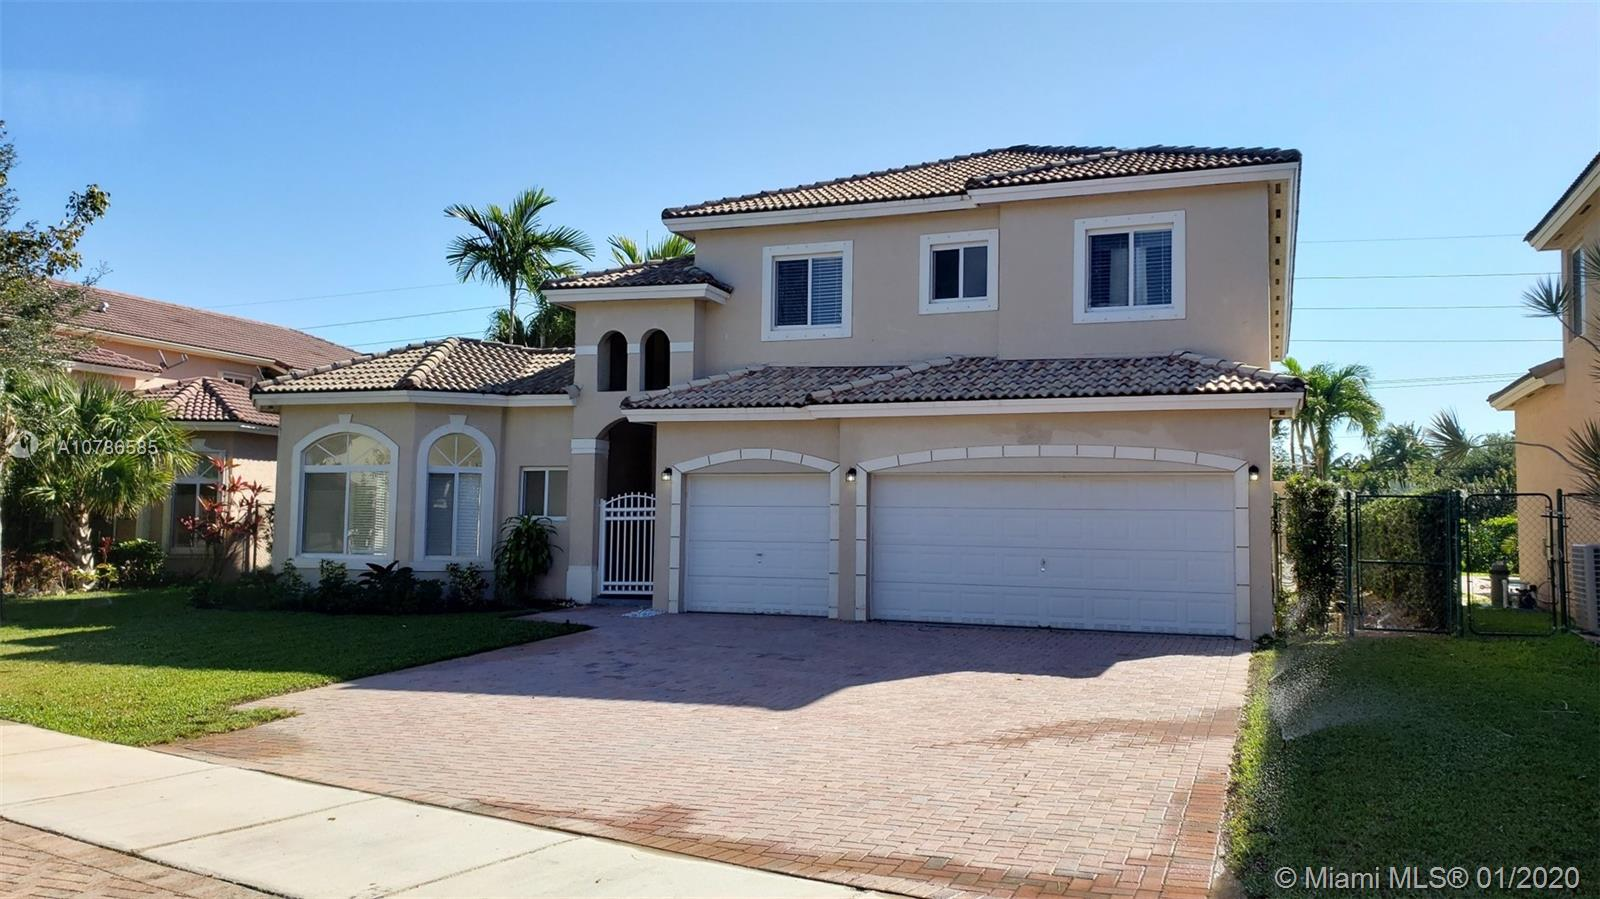 1898 SE 23rd Ct, Homestead, FL 33035 - Homestead, FL real estate listing